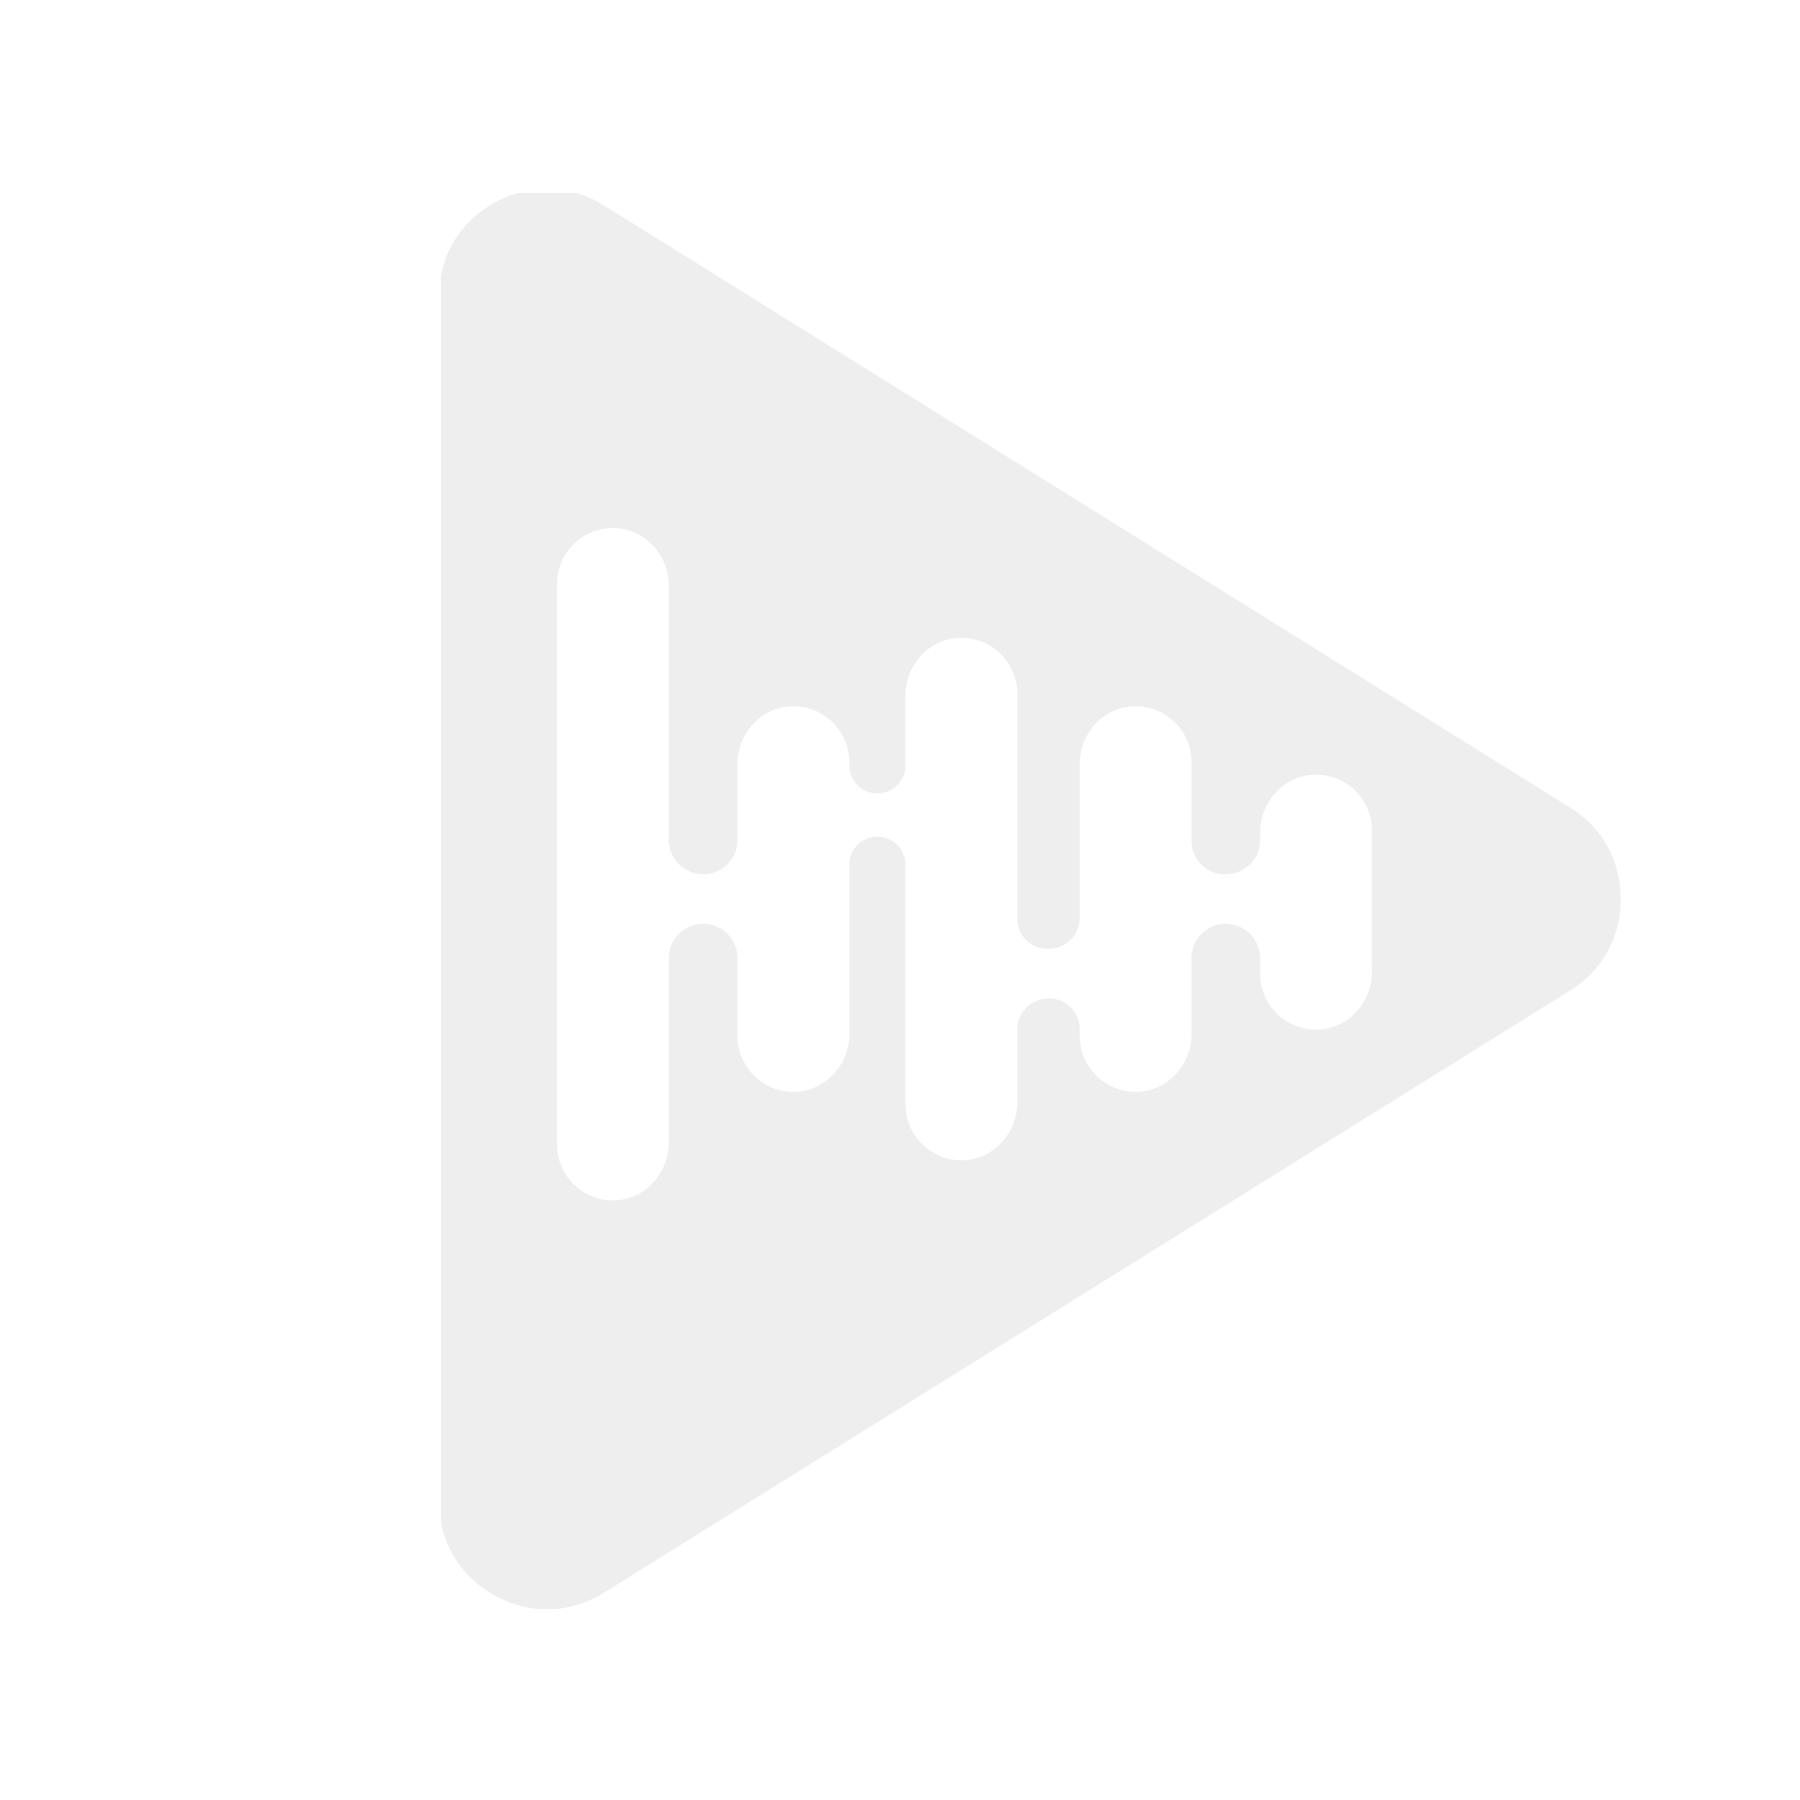 Bandridge BCL4105 USB A-B Device Cable 4.5m